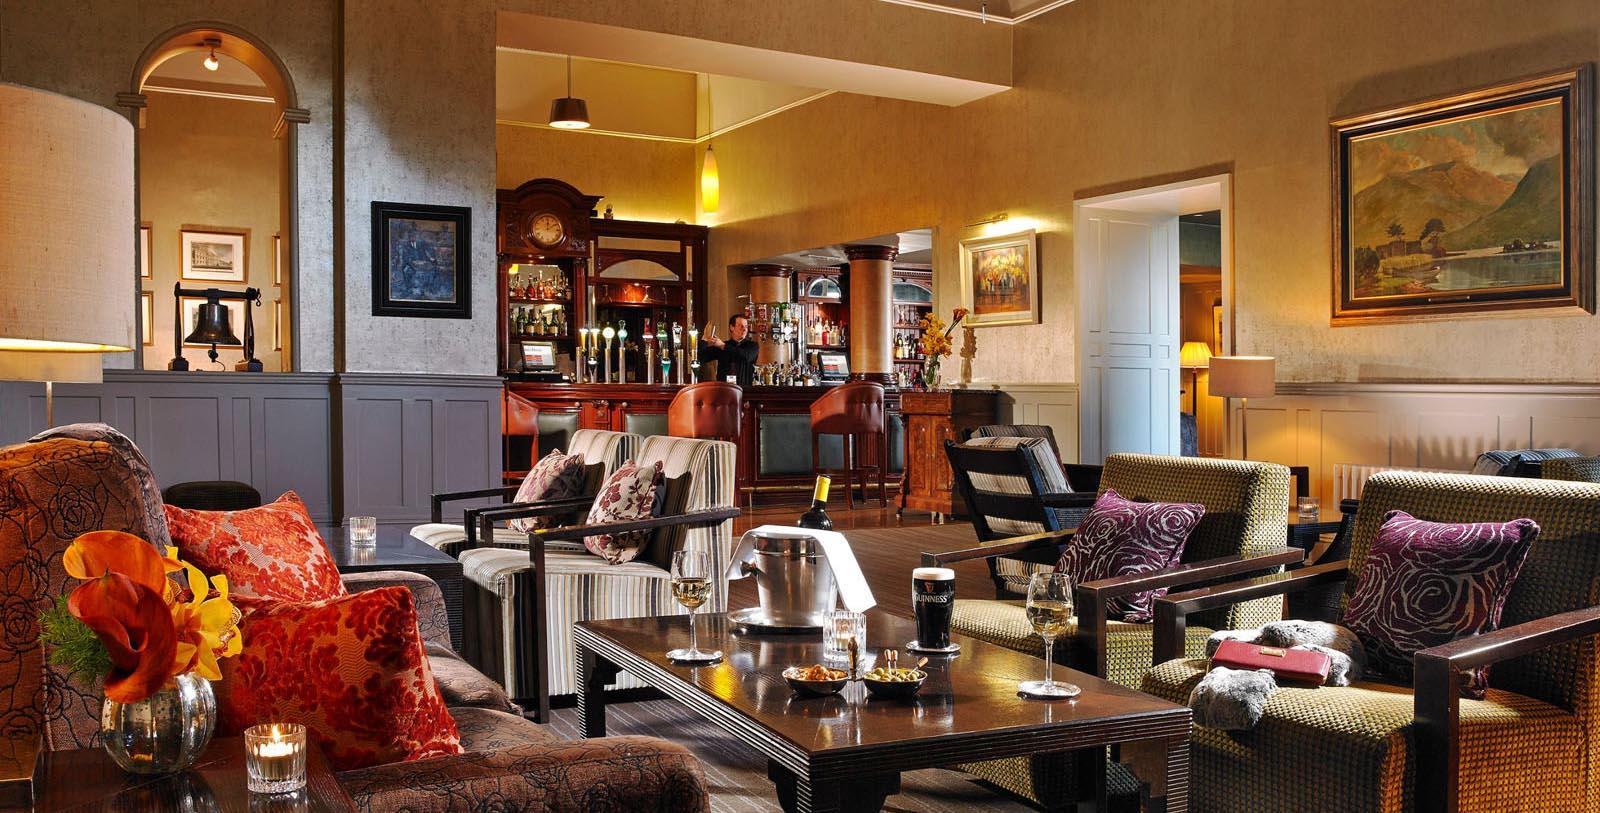 Image of hotel exterior Great Southern Killarney, 1854, Member of Historic Hotels Worldwide, in Killarney, Ireland, Taste